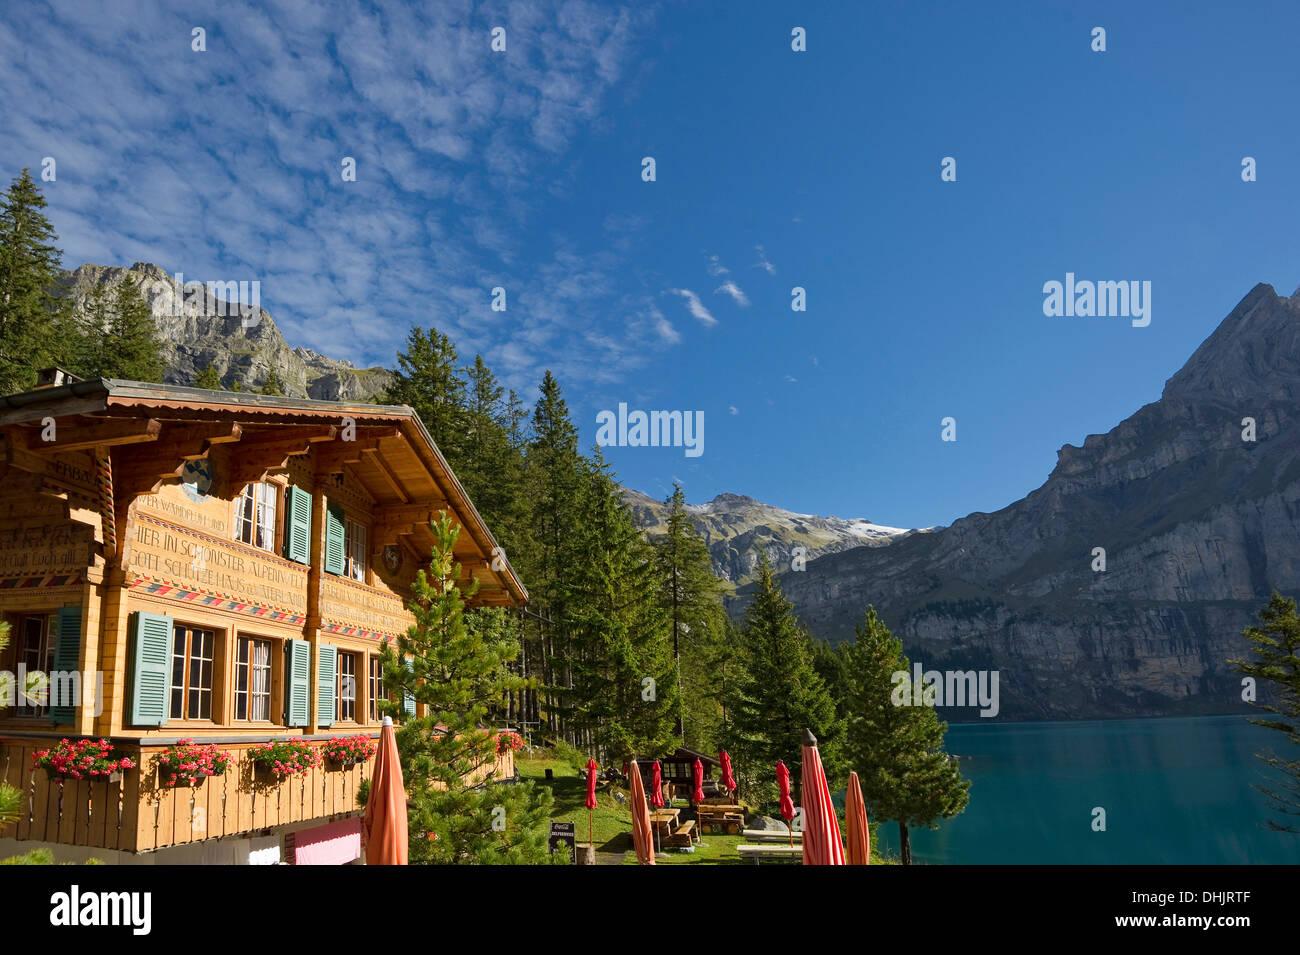 Chalet au lac Oeschinensee au soleil, Kandersteg, Oberland Bernois, Canton de Berne, Suisse, Europe Photo Stock